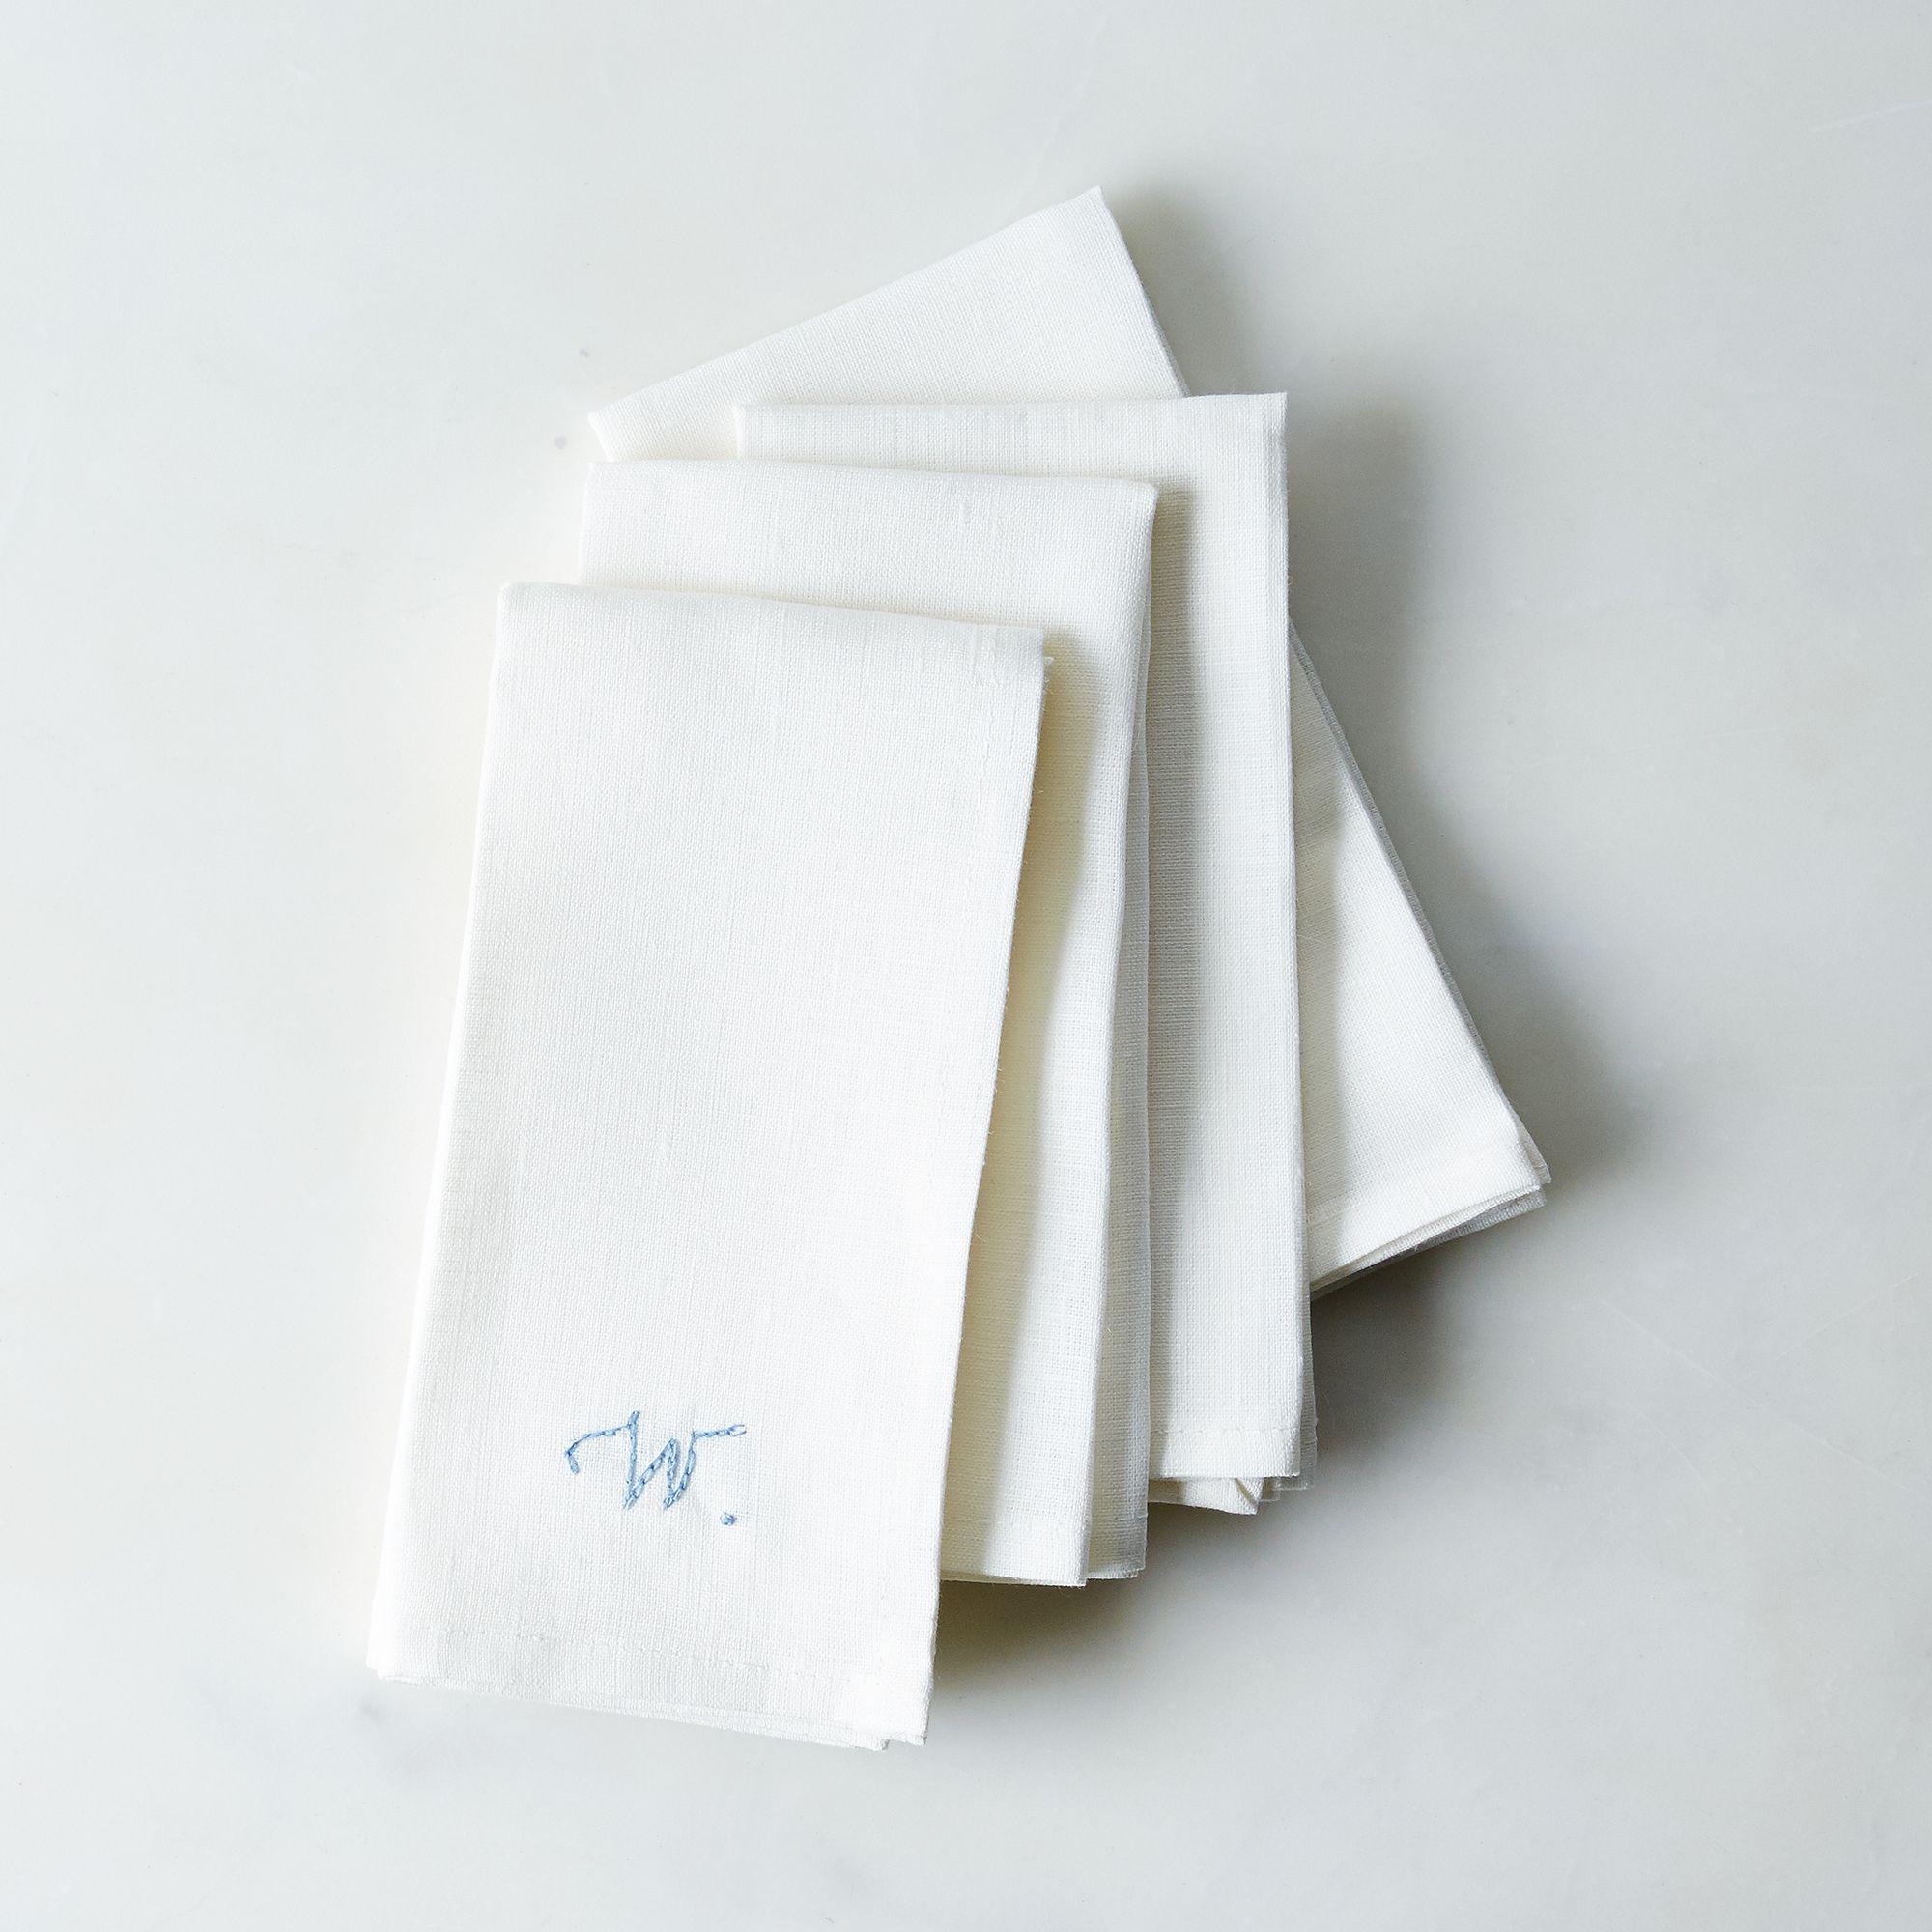 A80e6b9e a0f8 11e5 a190 0ef7535729df  2015 0705 celina mancurti white linen napkins set of 4 monogrammed silo rocky luten 001